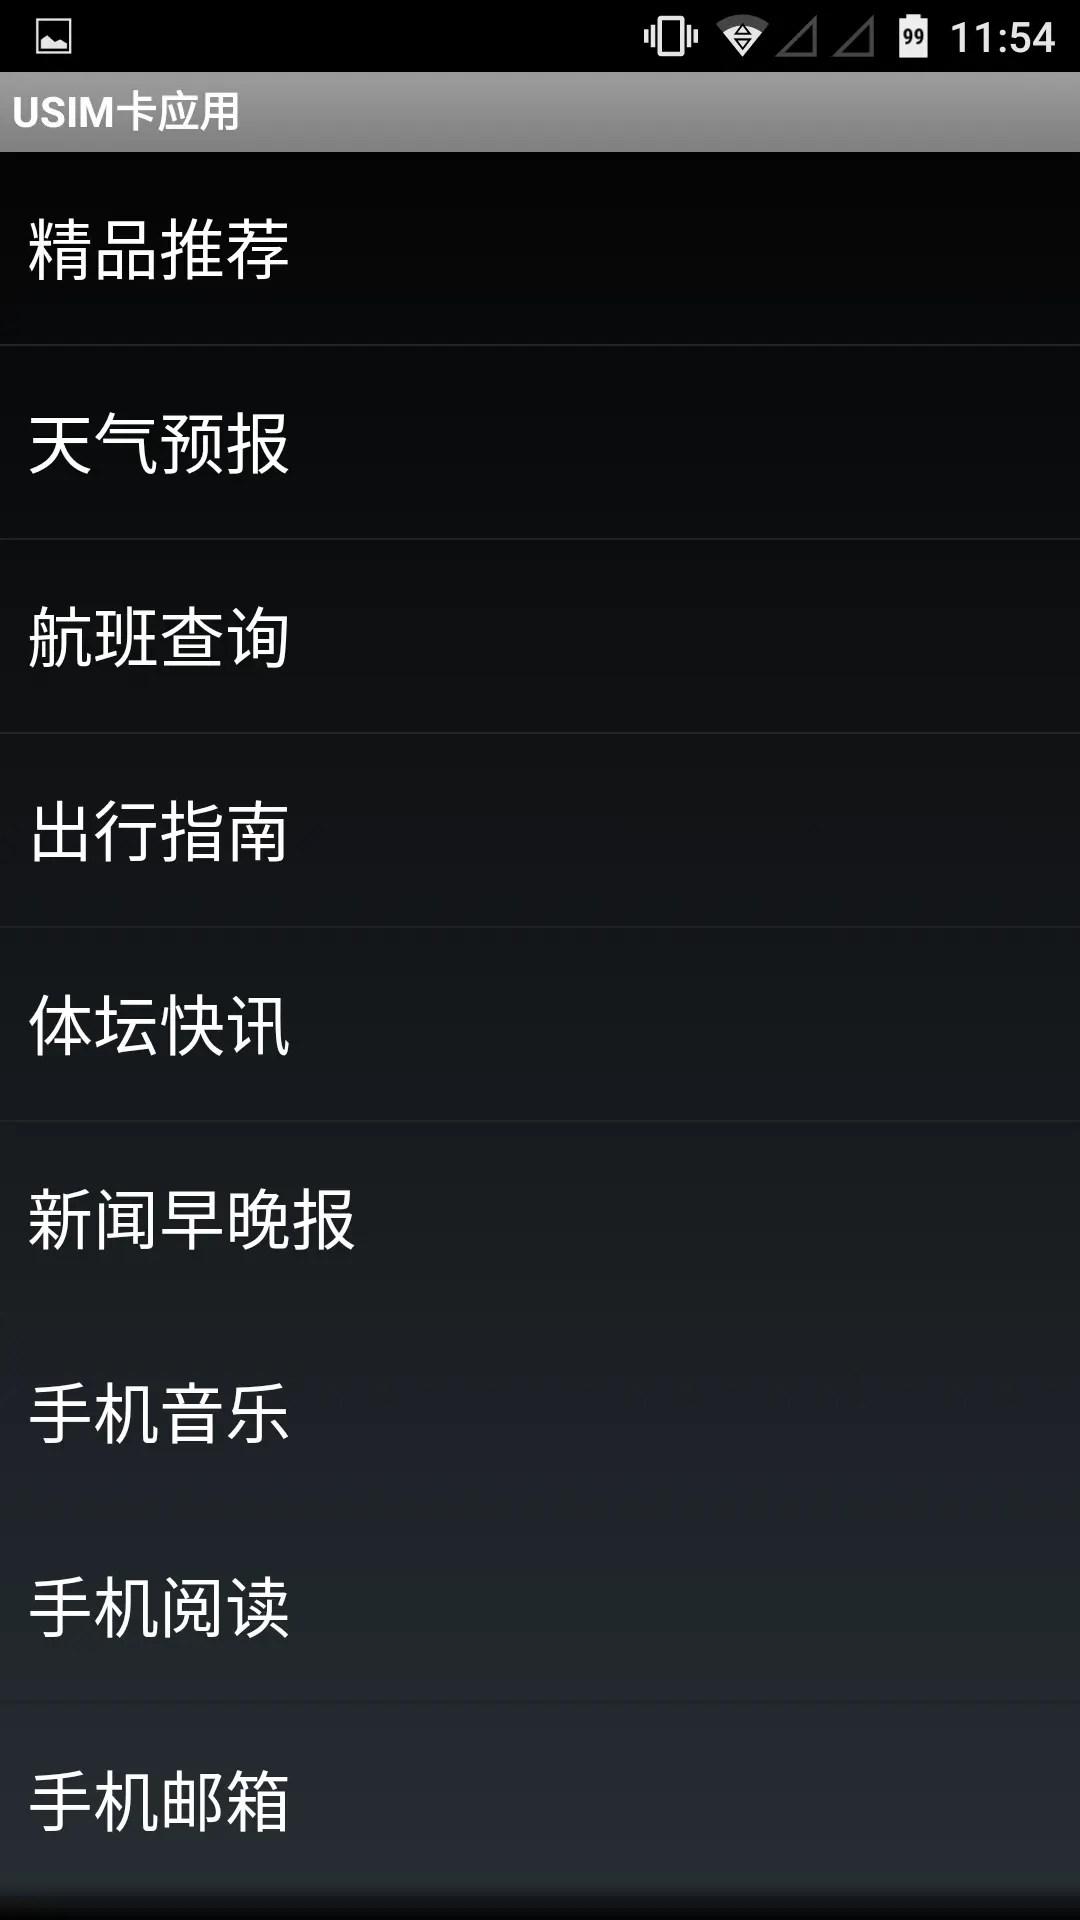 CU(China Unicom)だけが反応してなにやら表示する